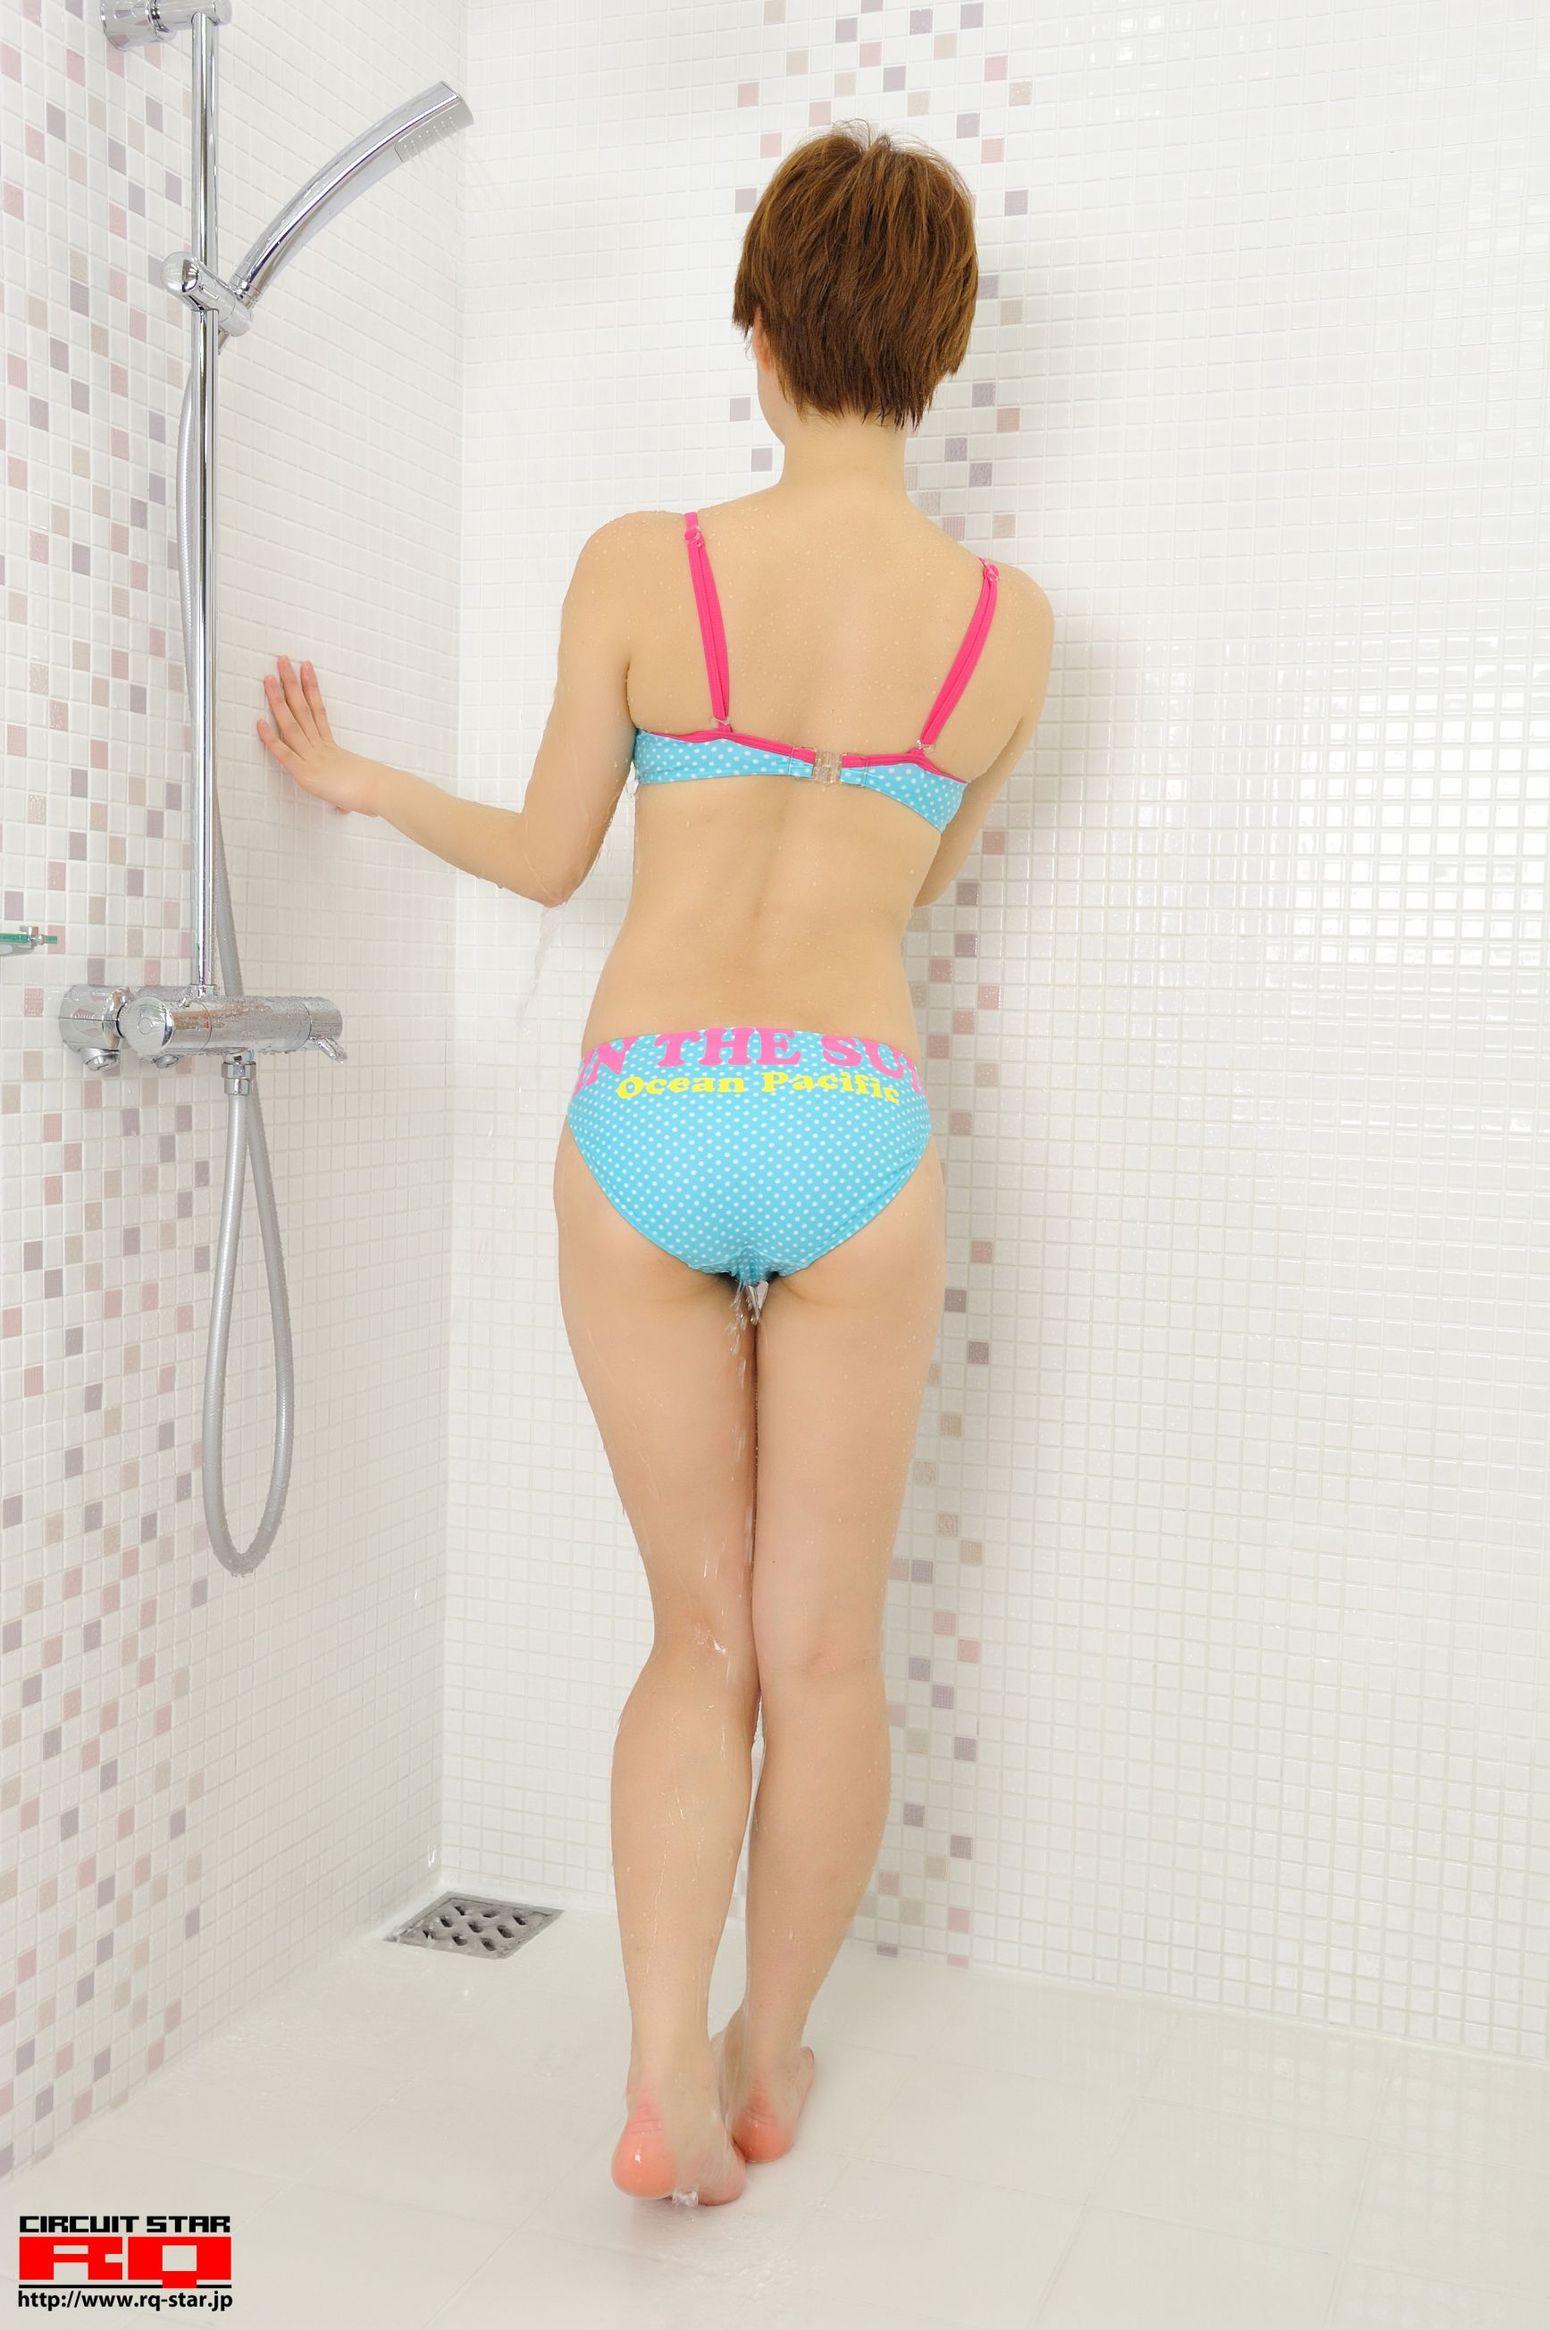 [RQ-STAR] NO.00490 Chika Hori 堀ちか Swim Suits 写真集1